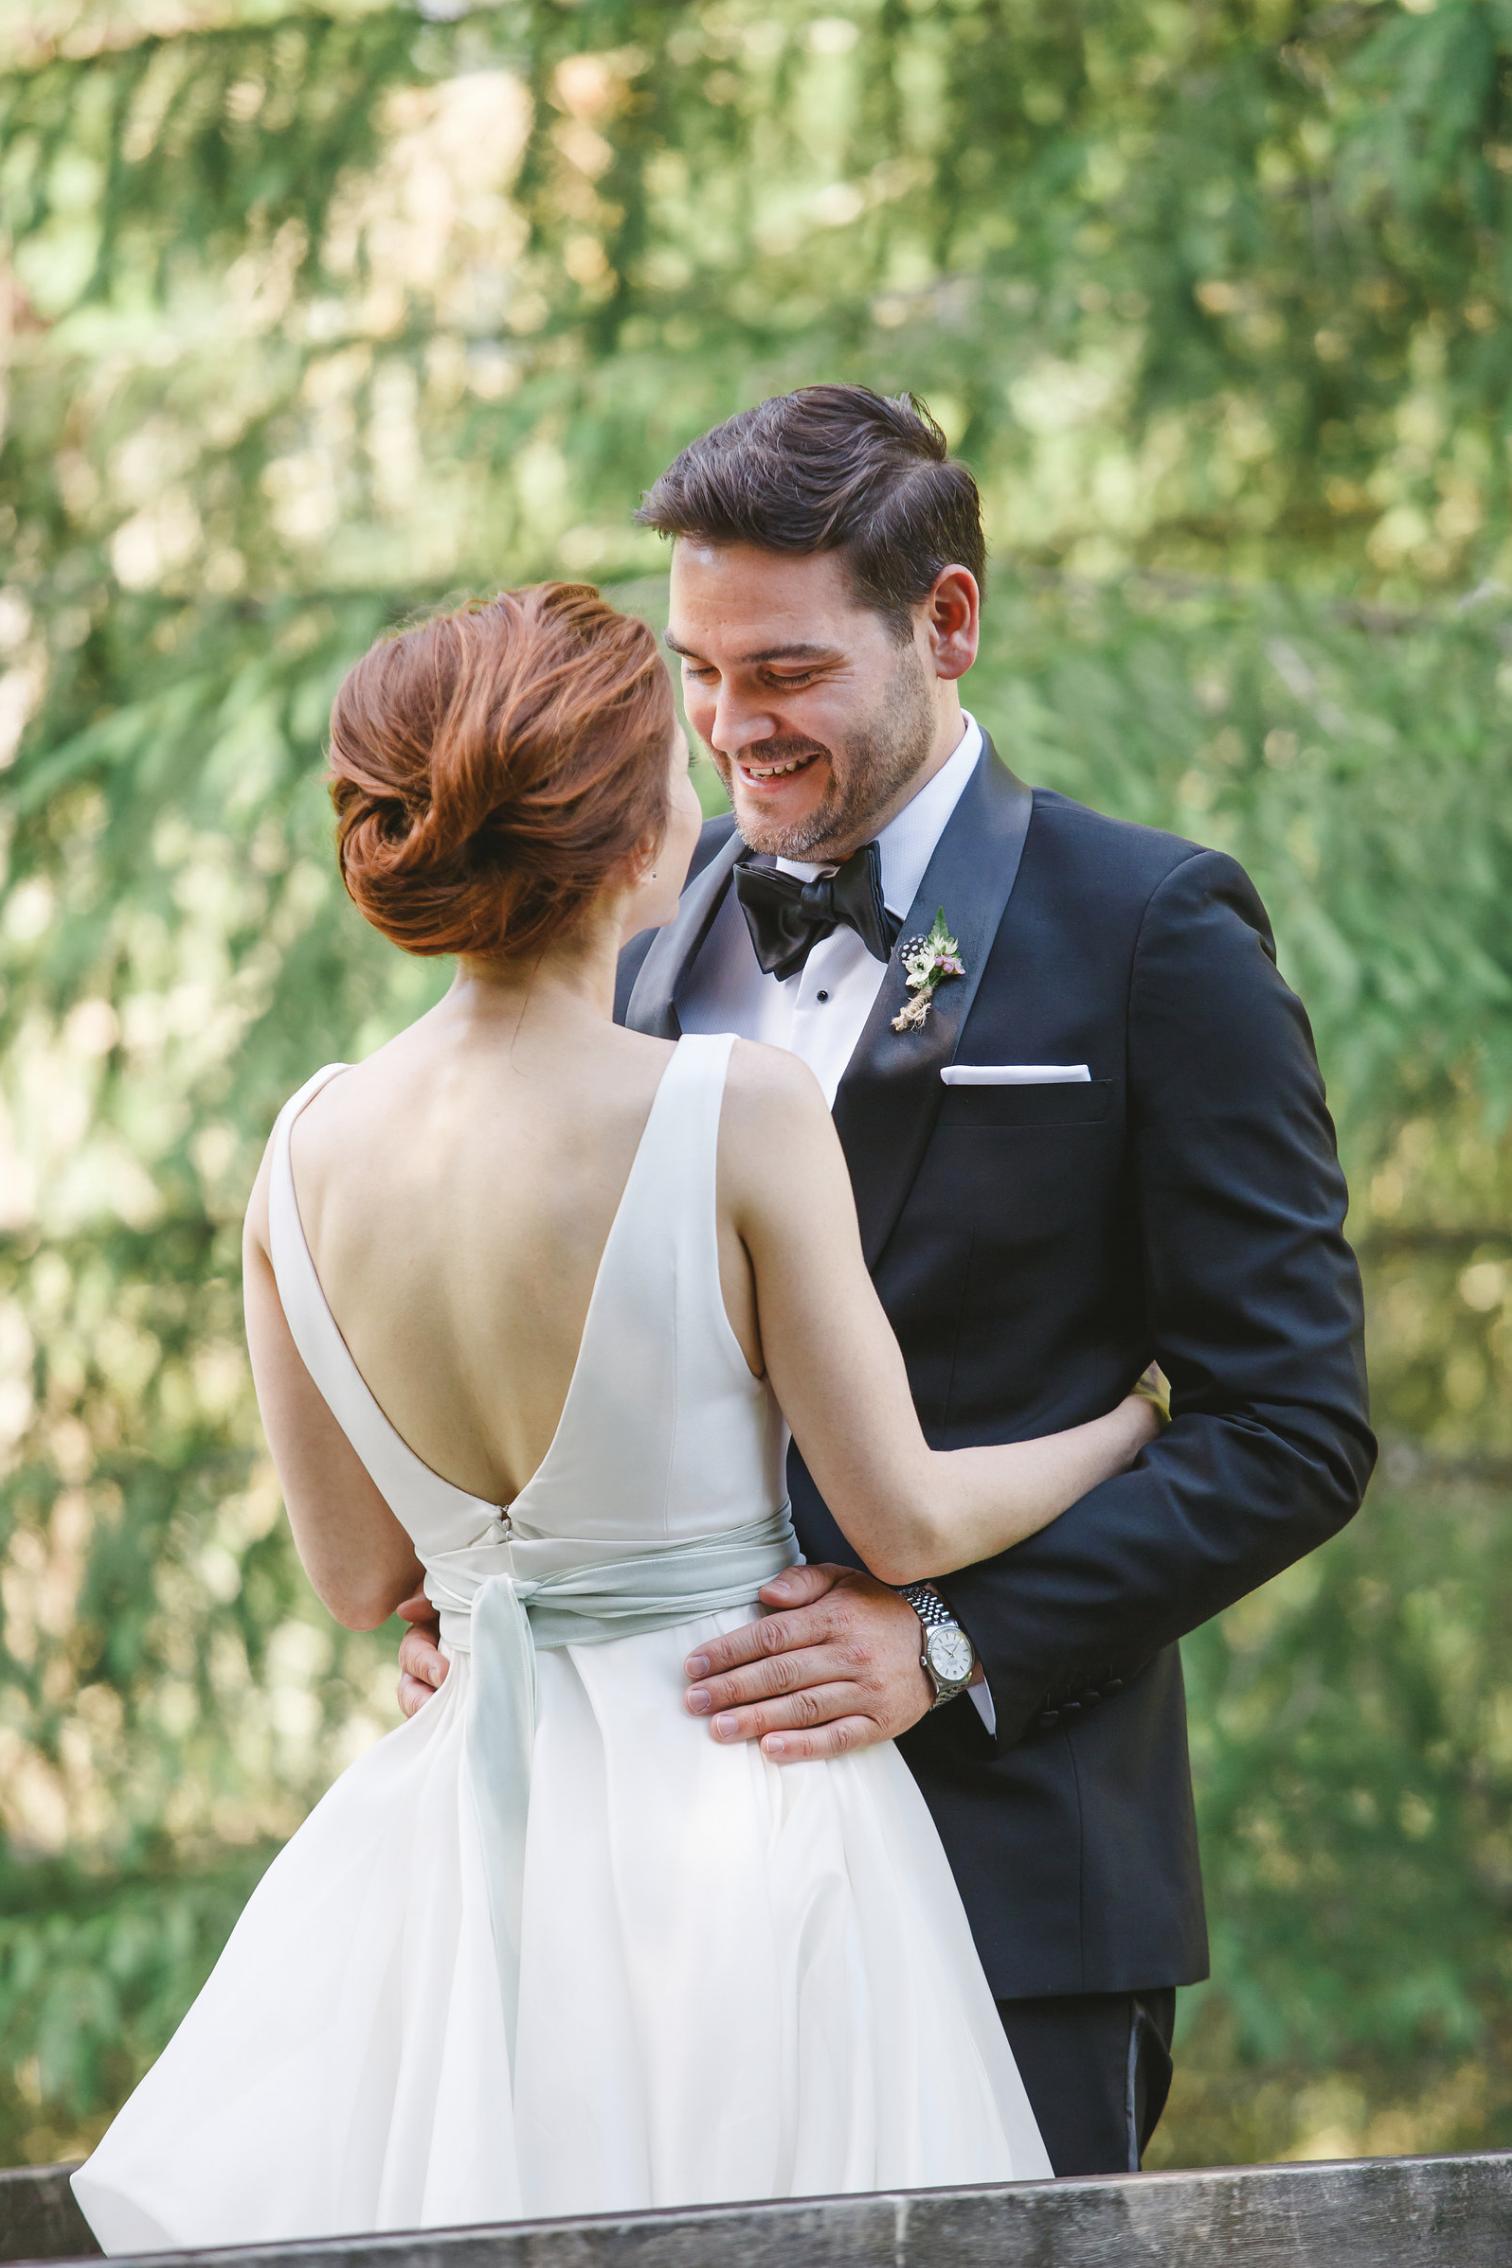 Carol Hannah Azurite Real Wedding Bridget+Tyler5.png